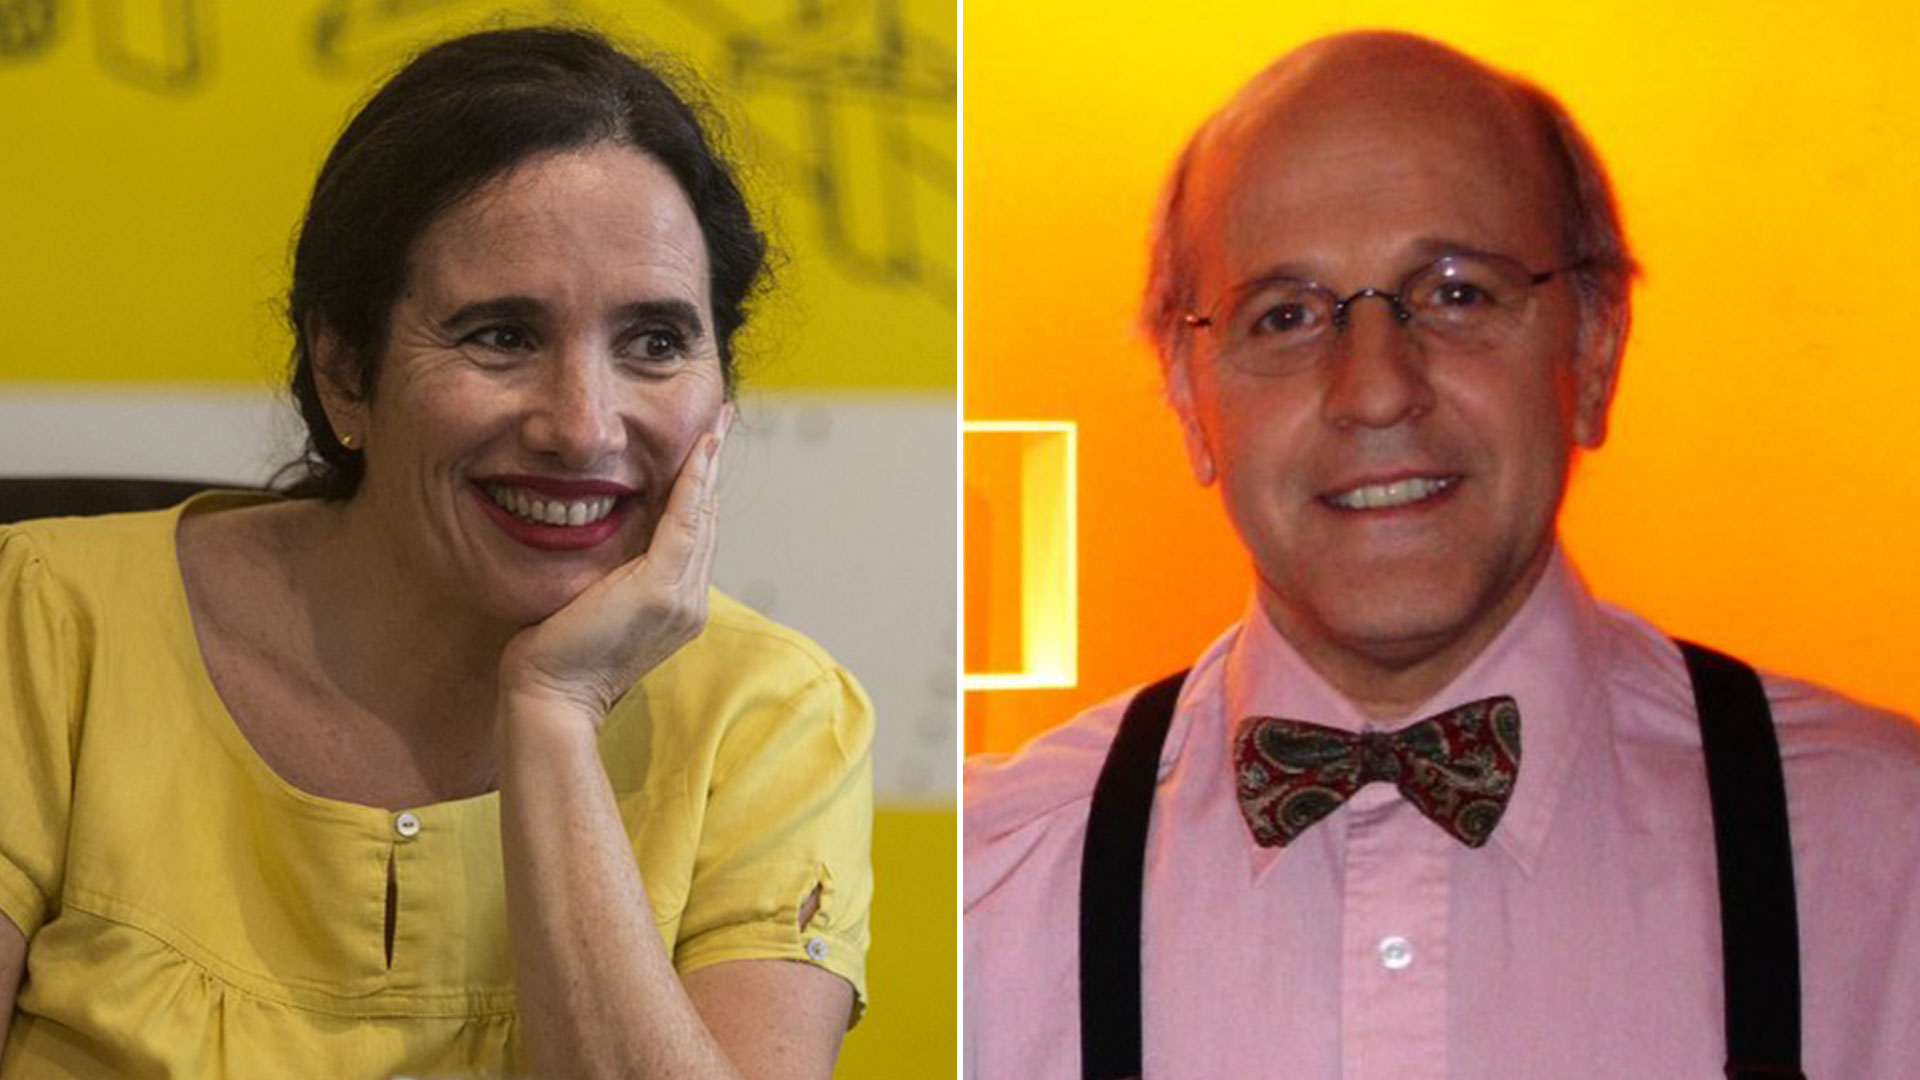 Carolina Biquard y Mariano Roca